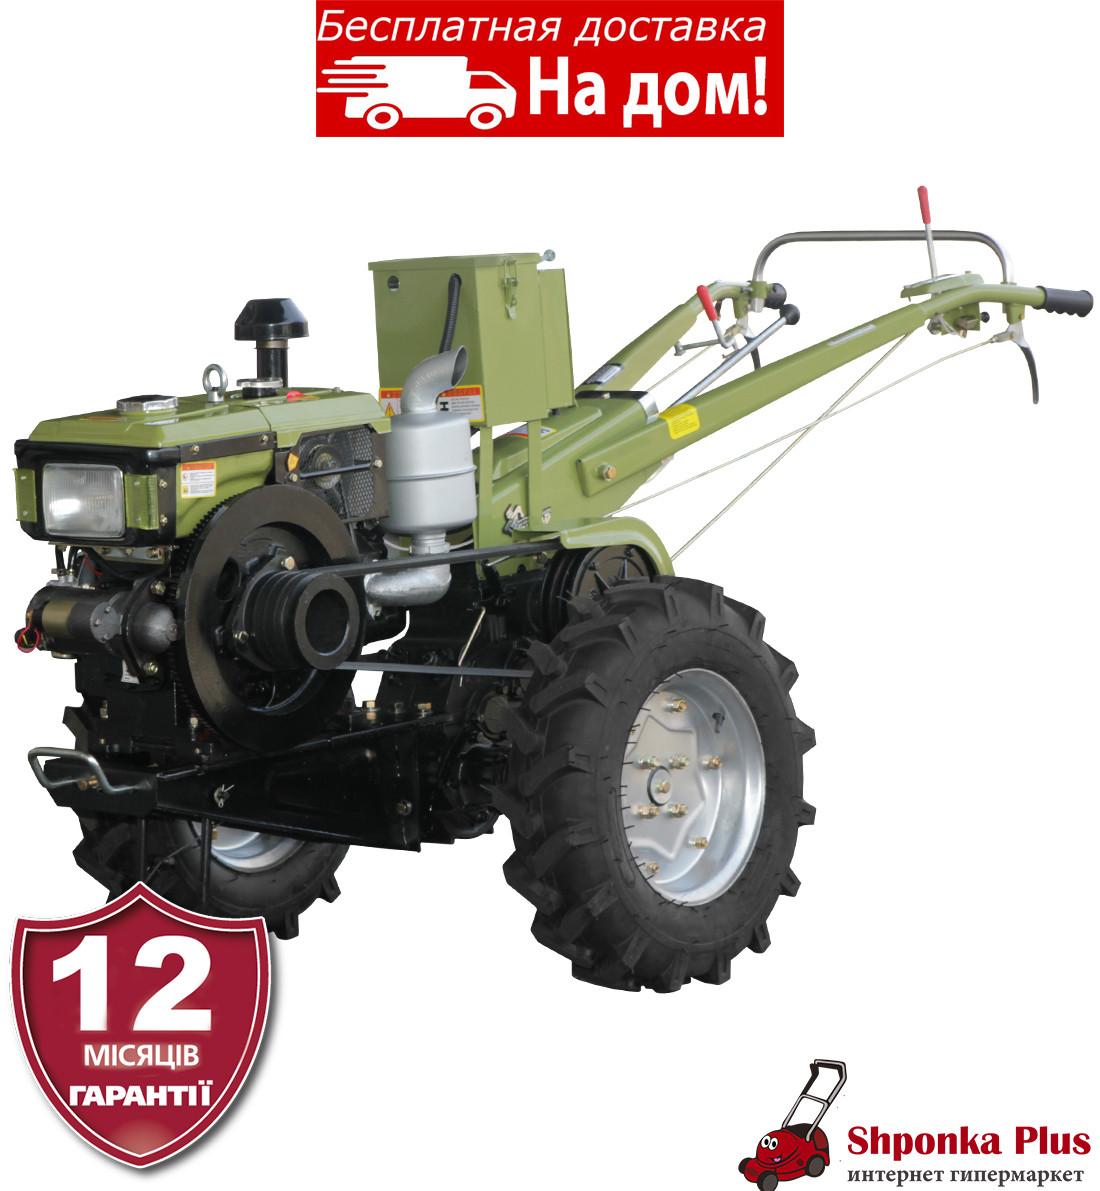 Мотоблок 12л.с., с фрезой, электростартер Кентавр МБ 1012Е